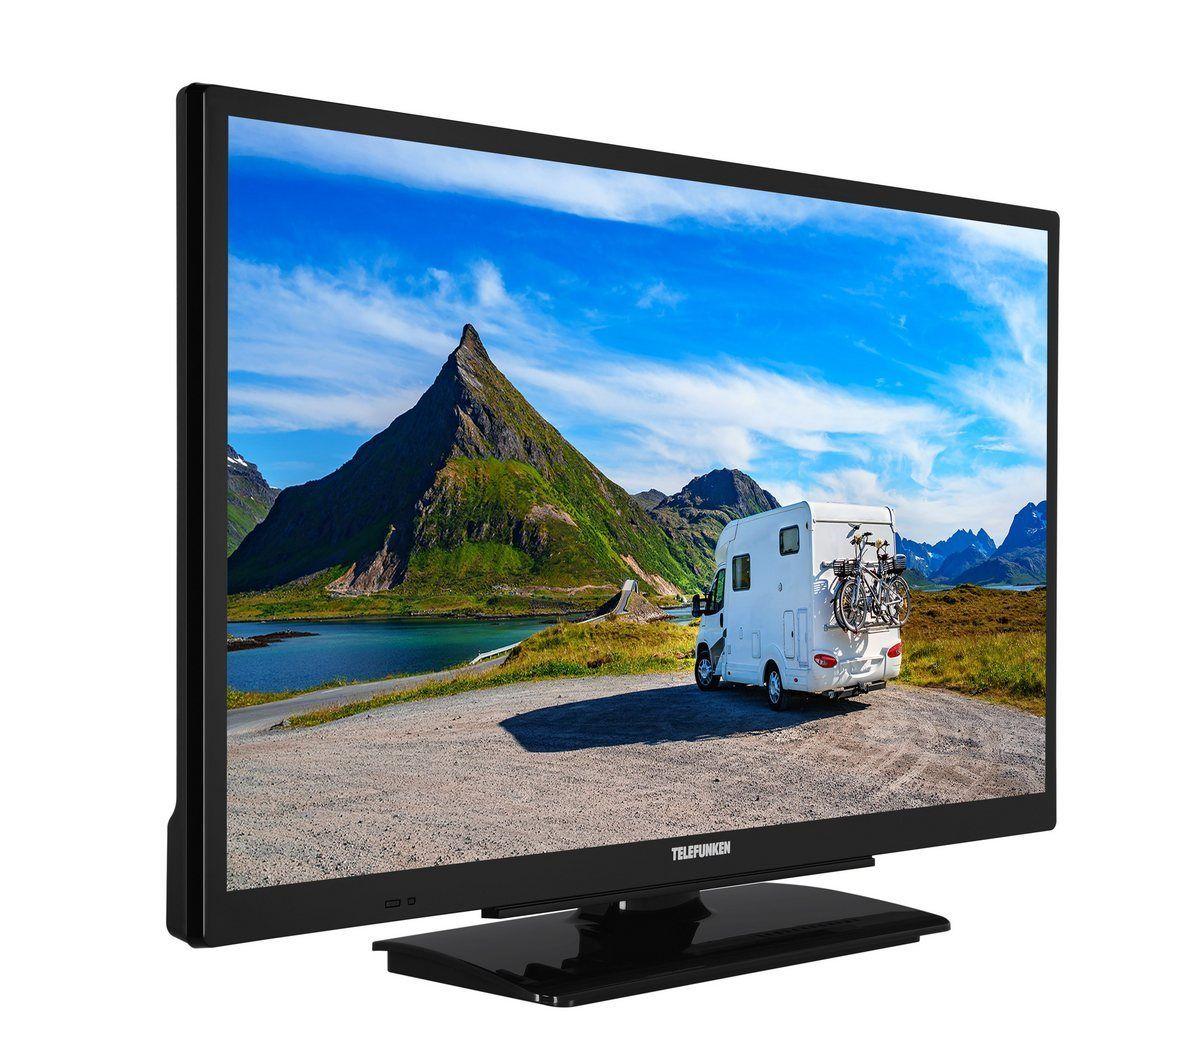 Buy Telefunken Led Tv 24 Inch Hd Ready Smart Tv 12v